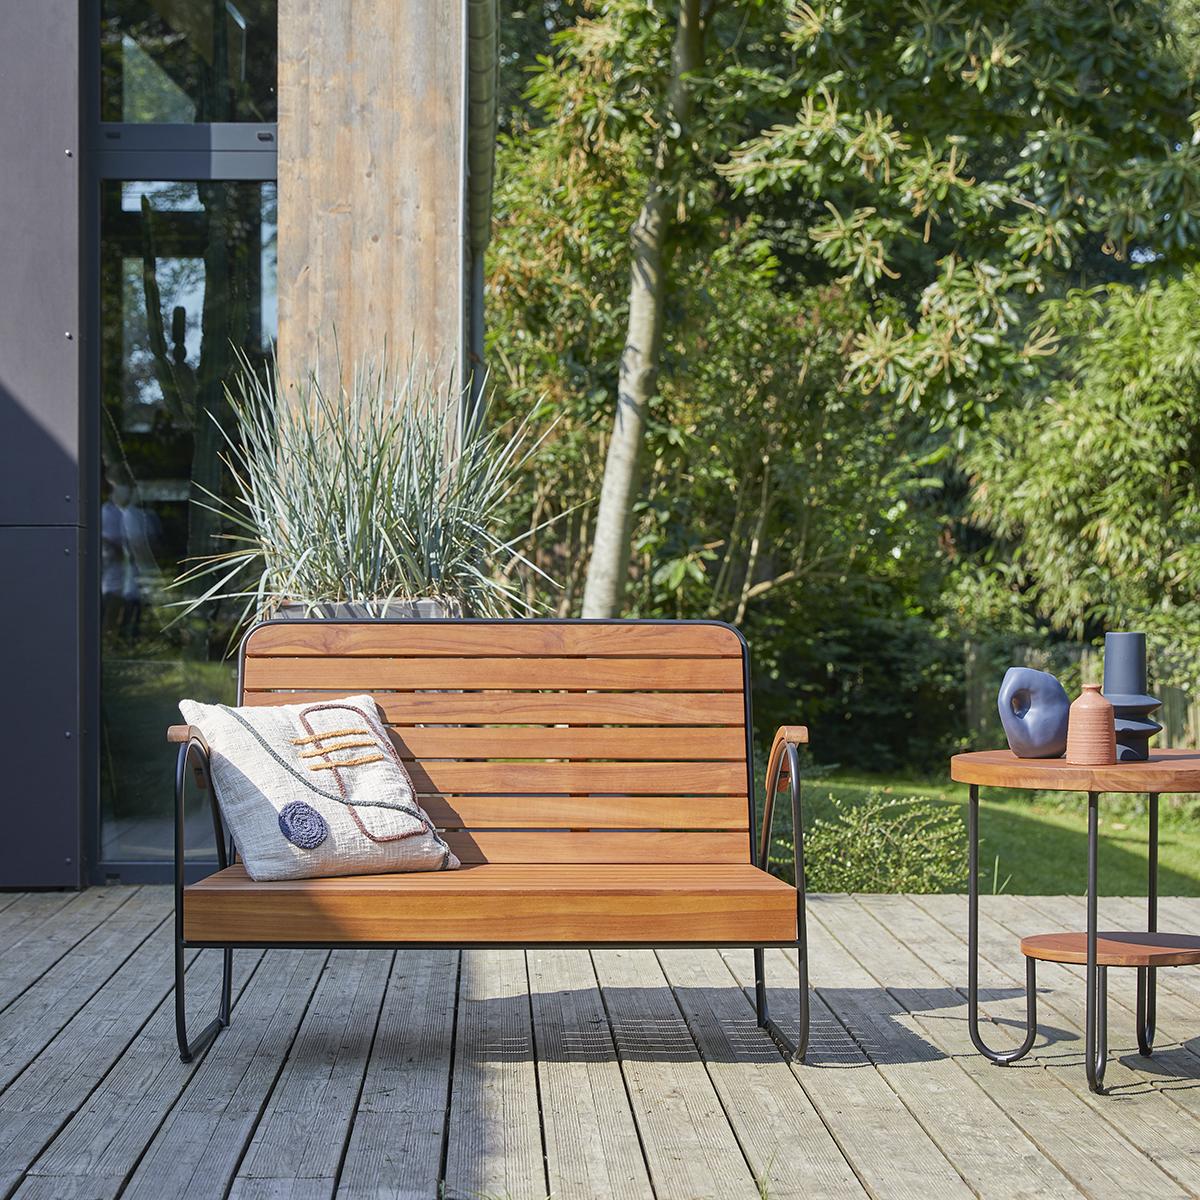 Key Wood solid teak garden Bench